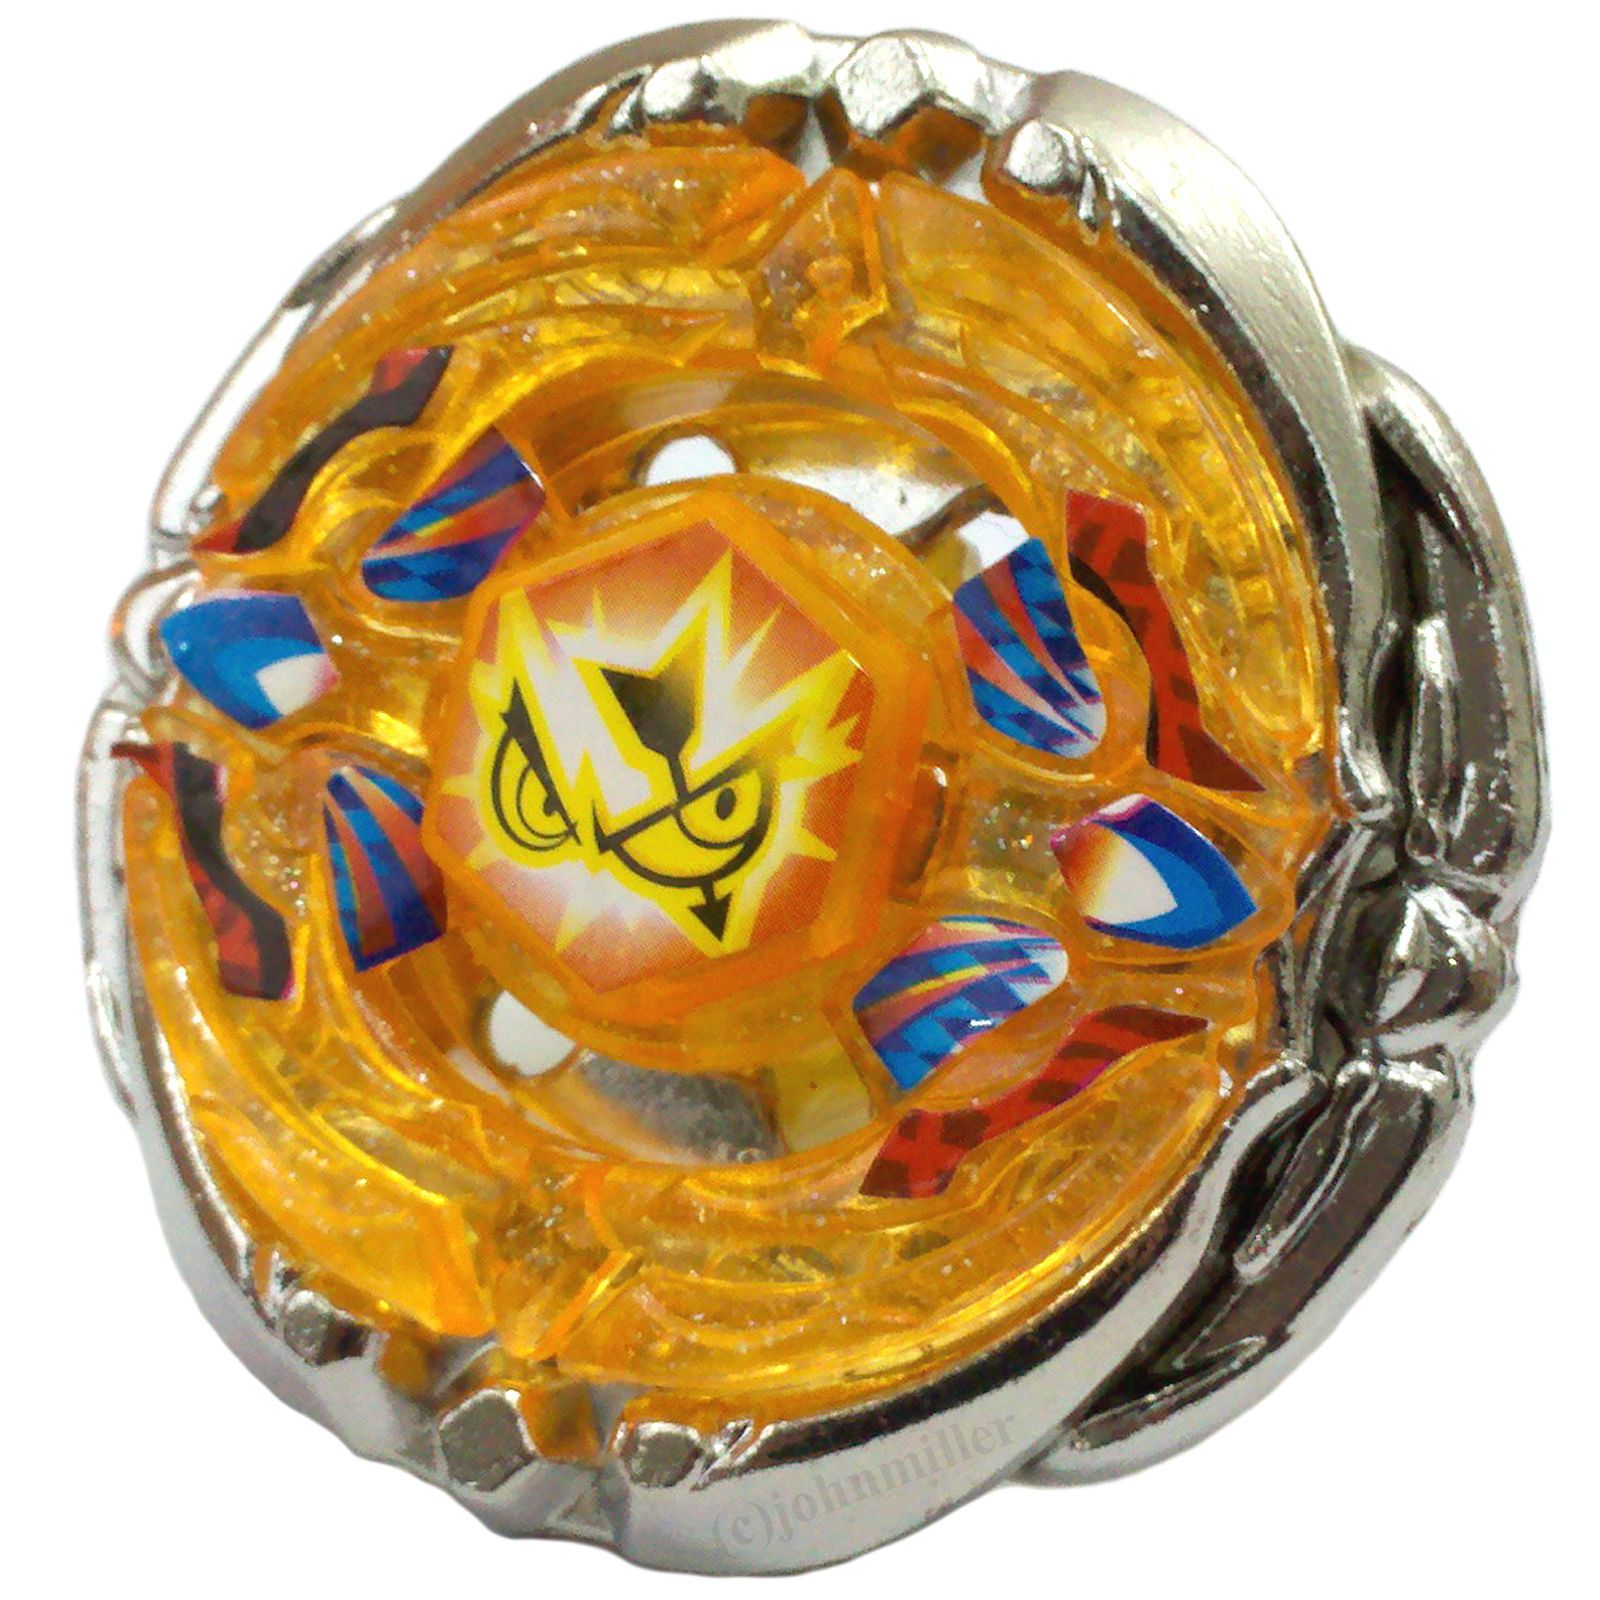 4D kreisel  für Beyblade Metall Fusion Metall Masters Falsh Sagittario